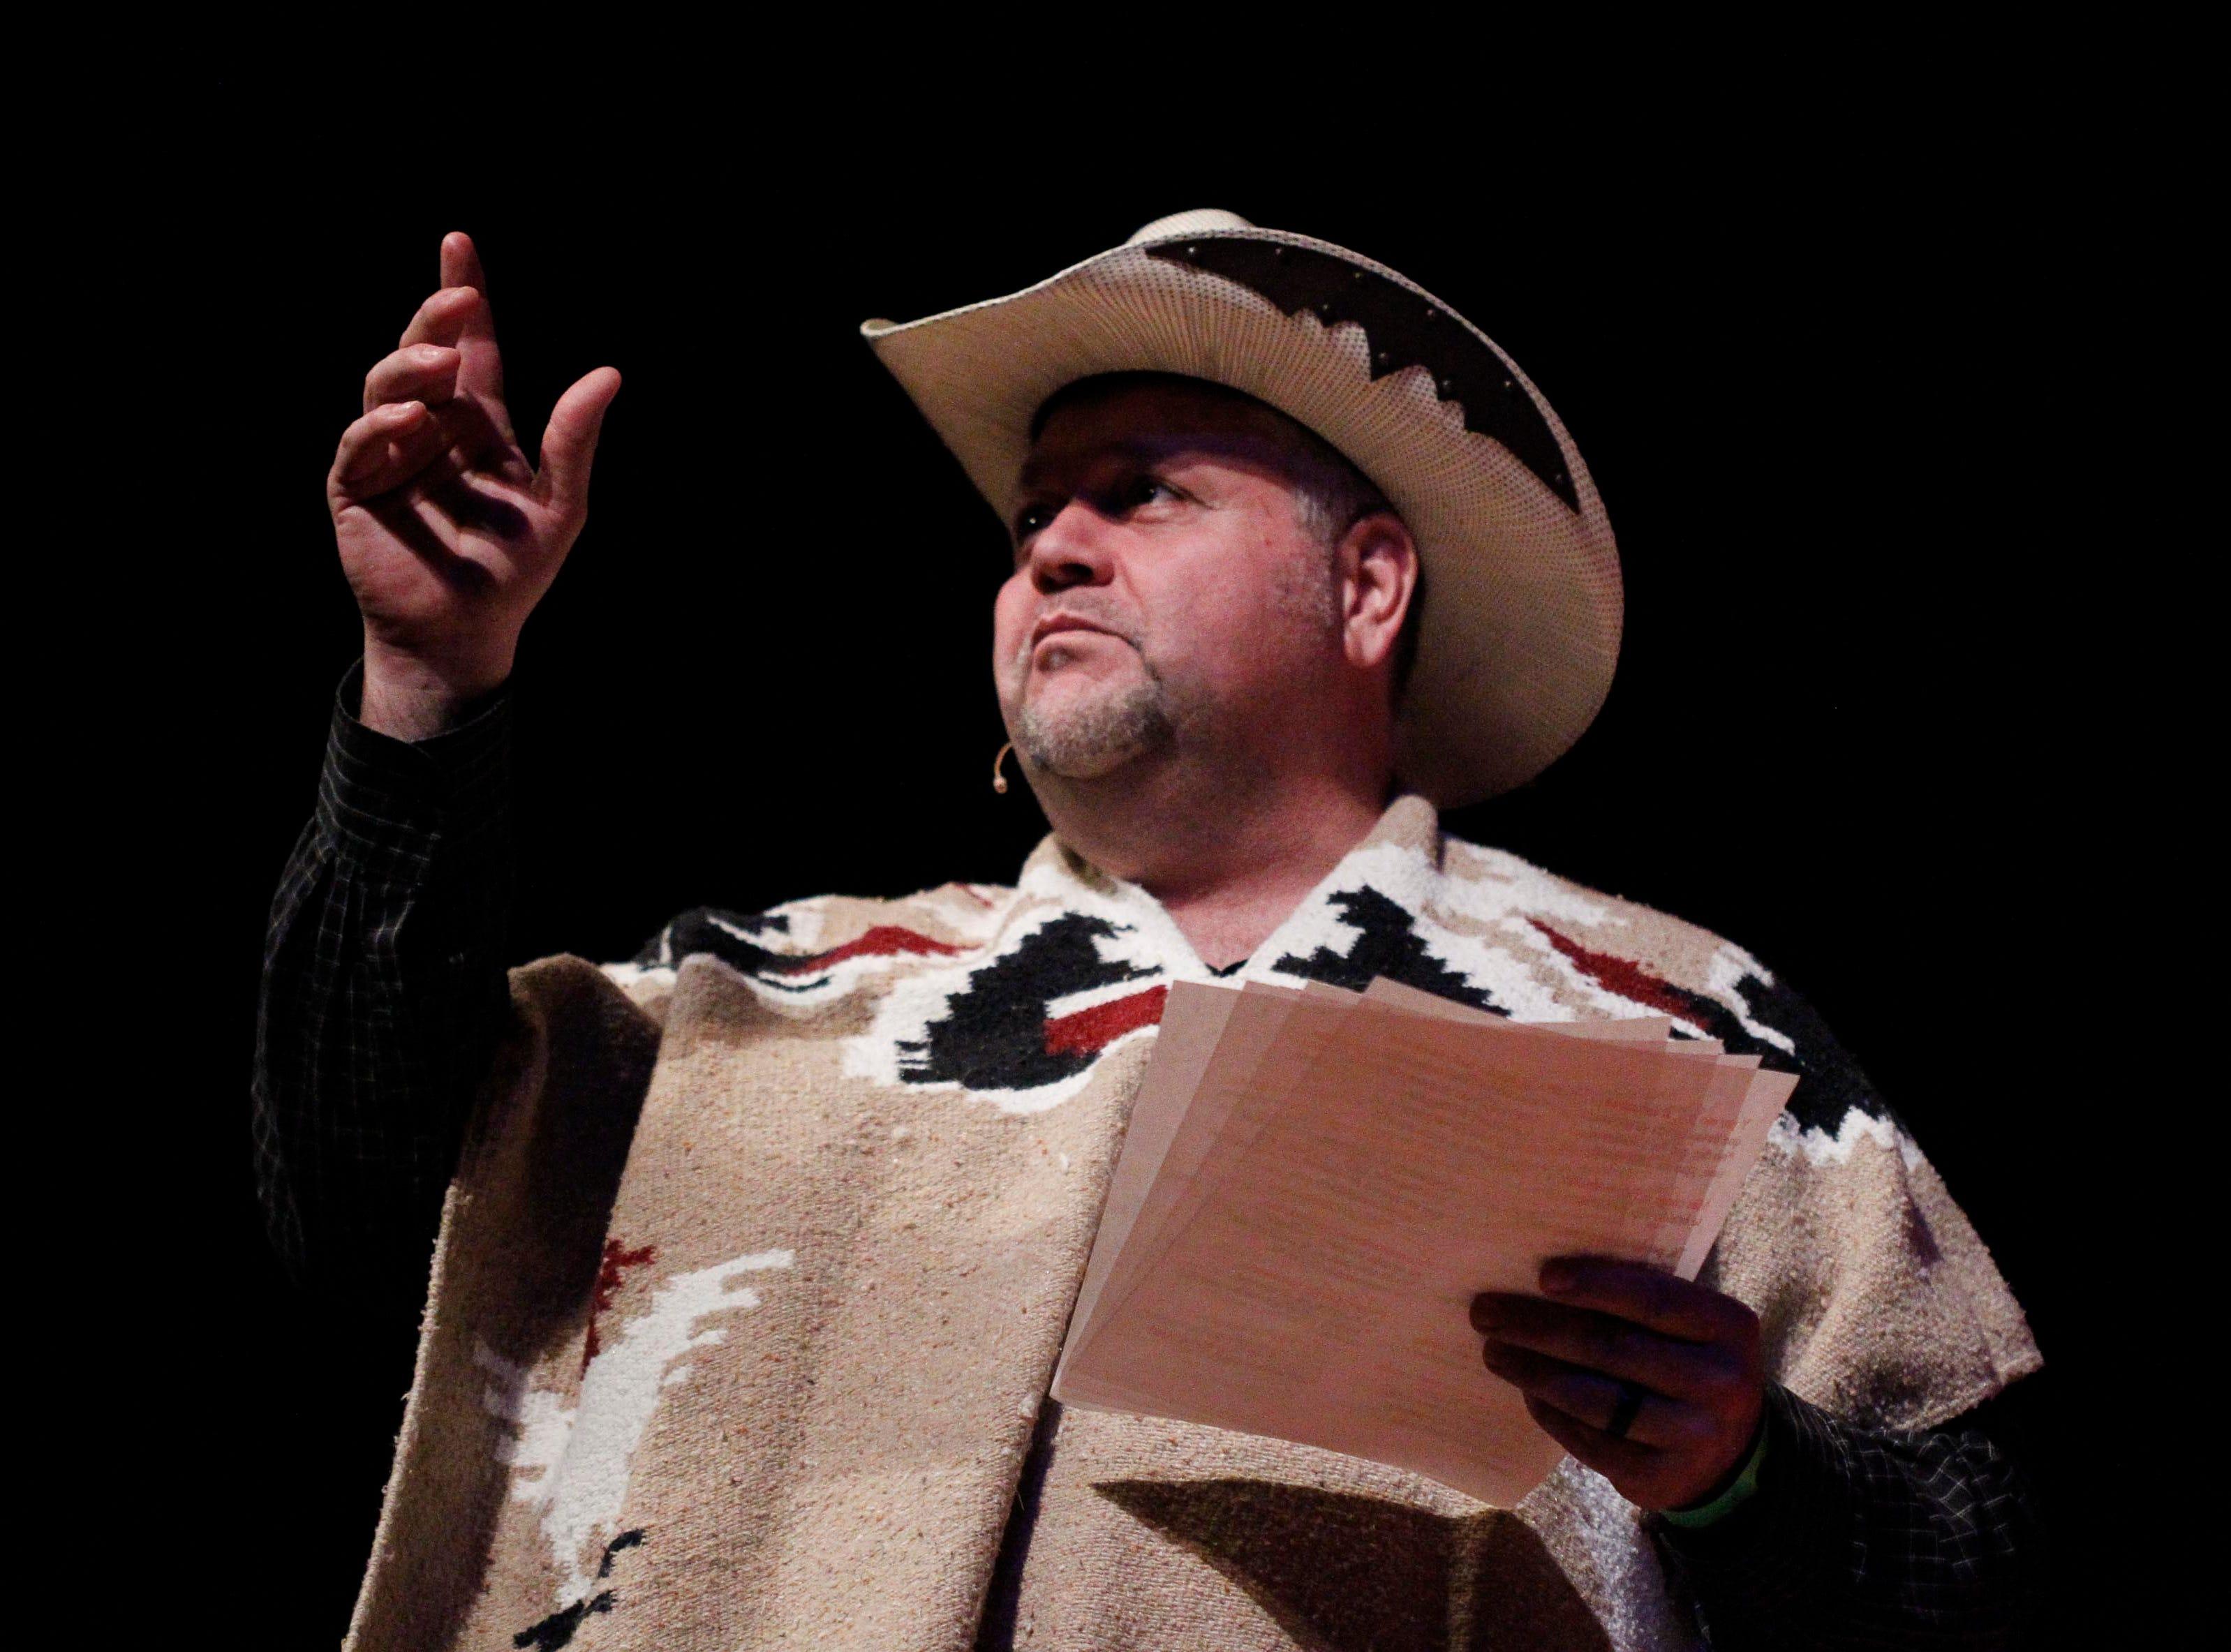 Octavio Valencia during the 12th annual Noche Bohemia at Sherwood Hall on Saturday, April 27, 2019 in Salinas, Calif.